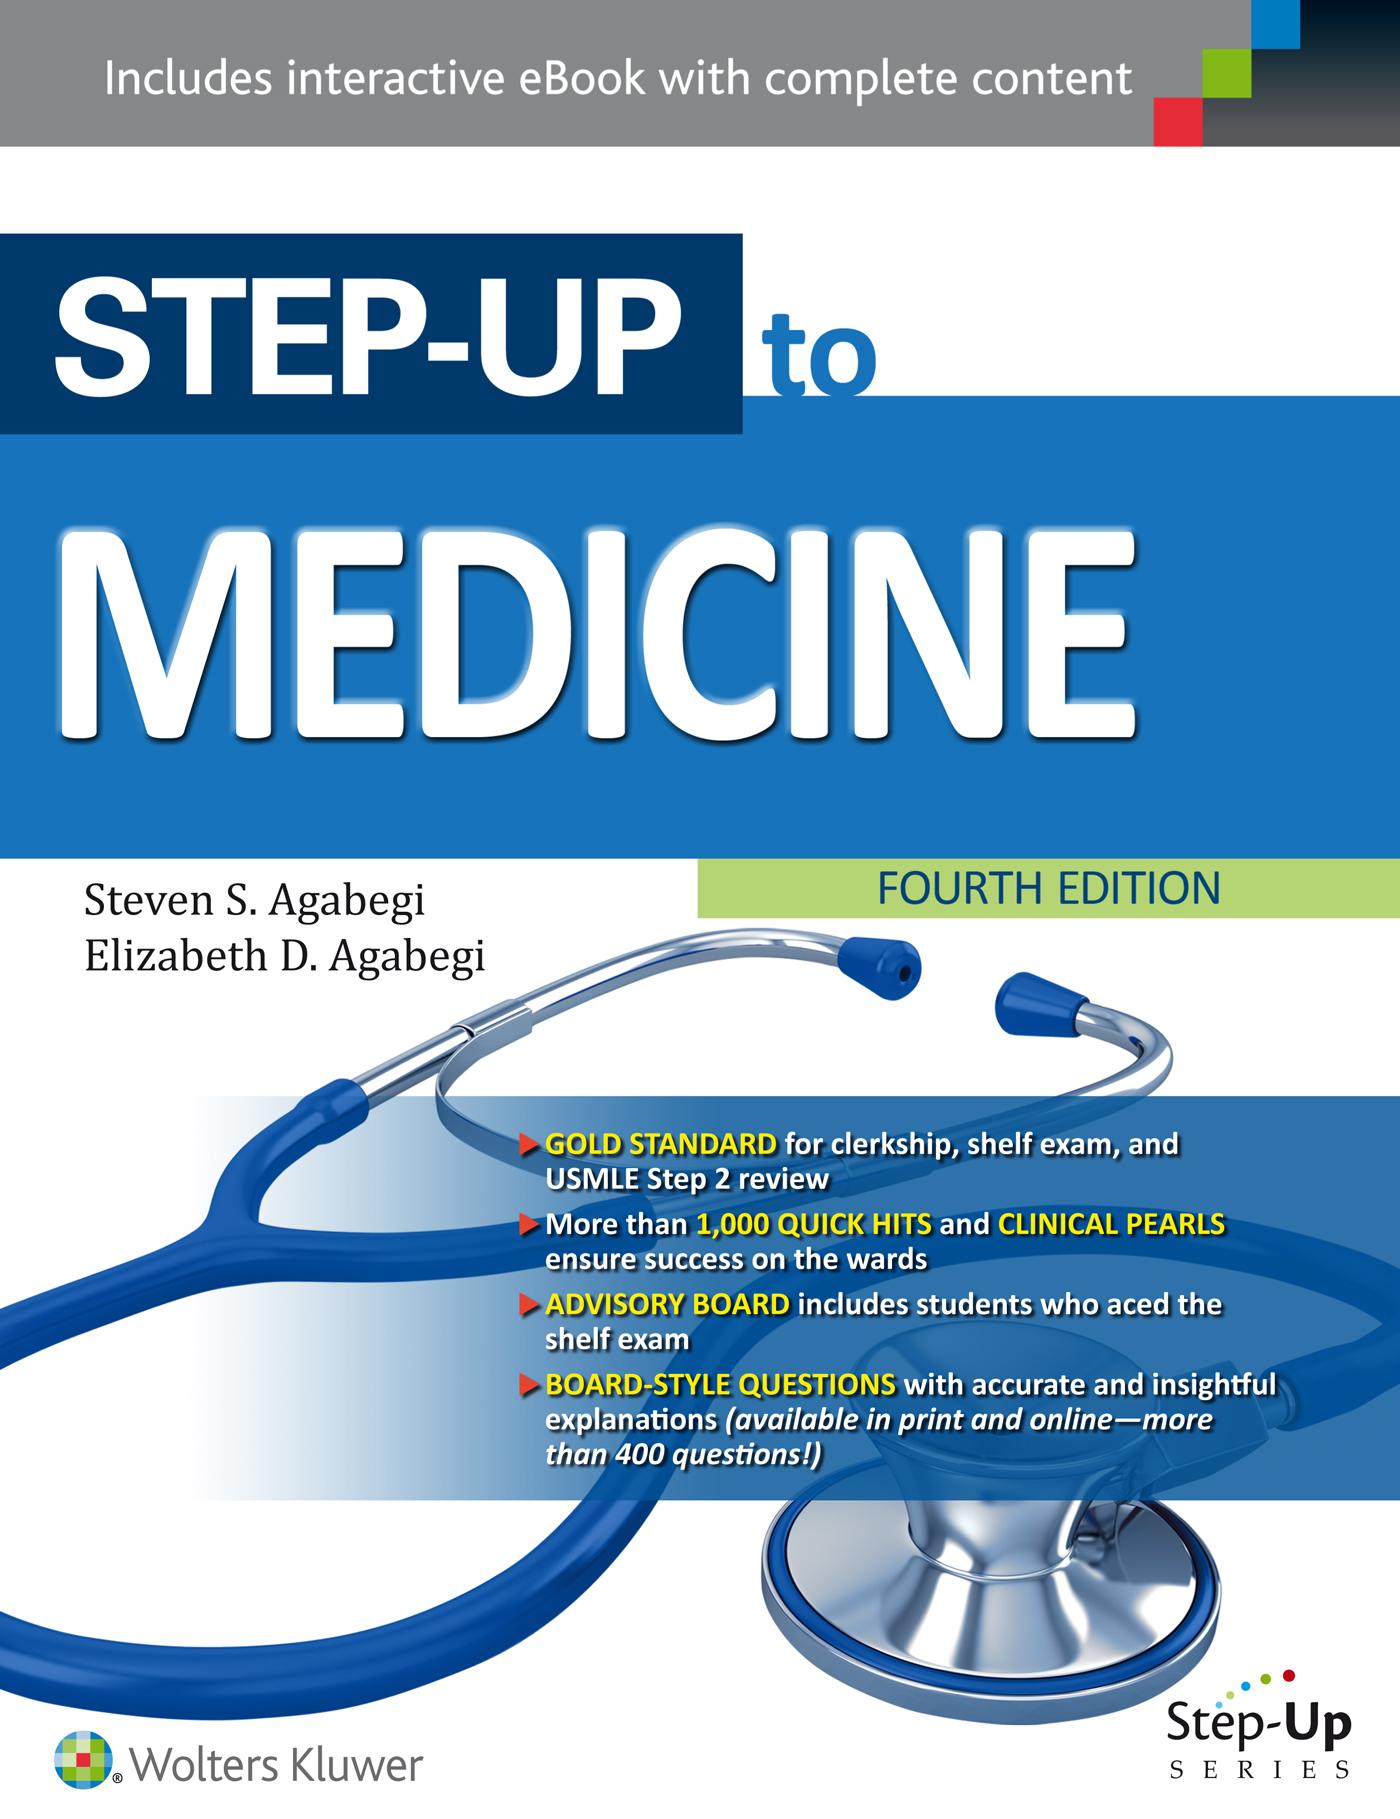 Download myanmar medical ebook free